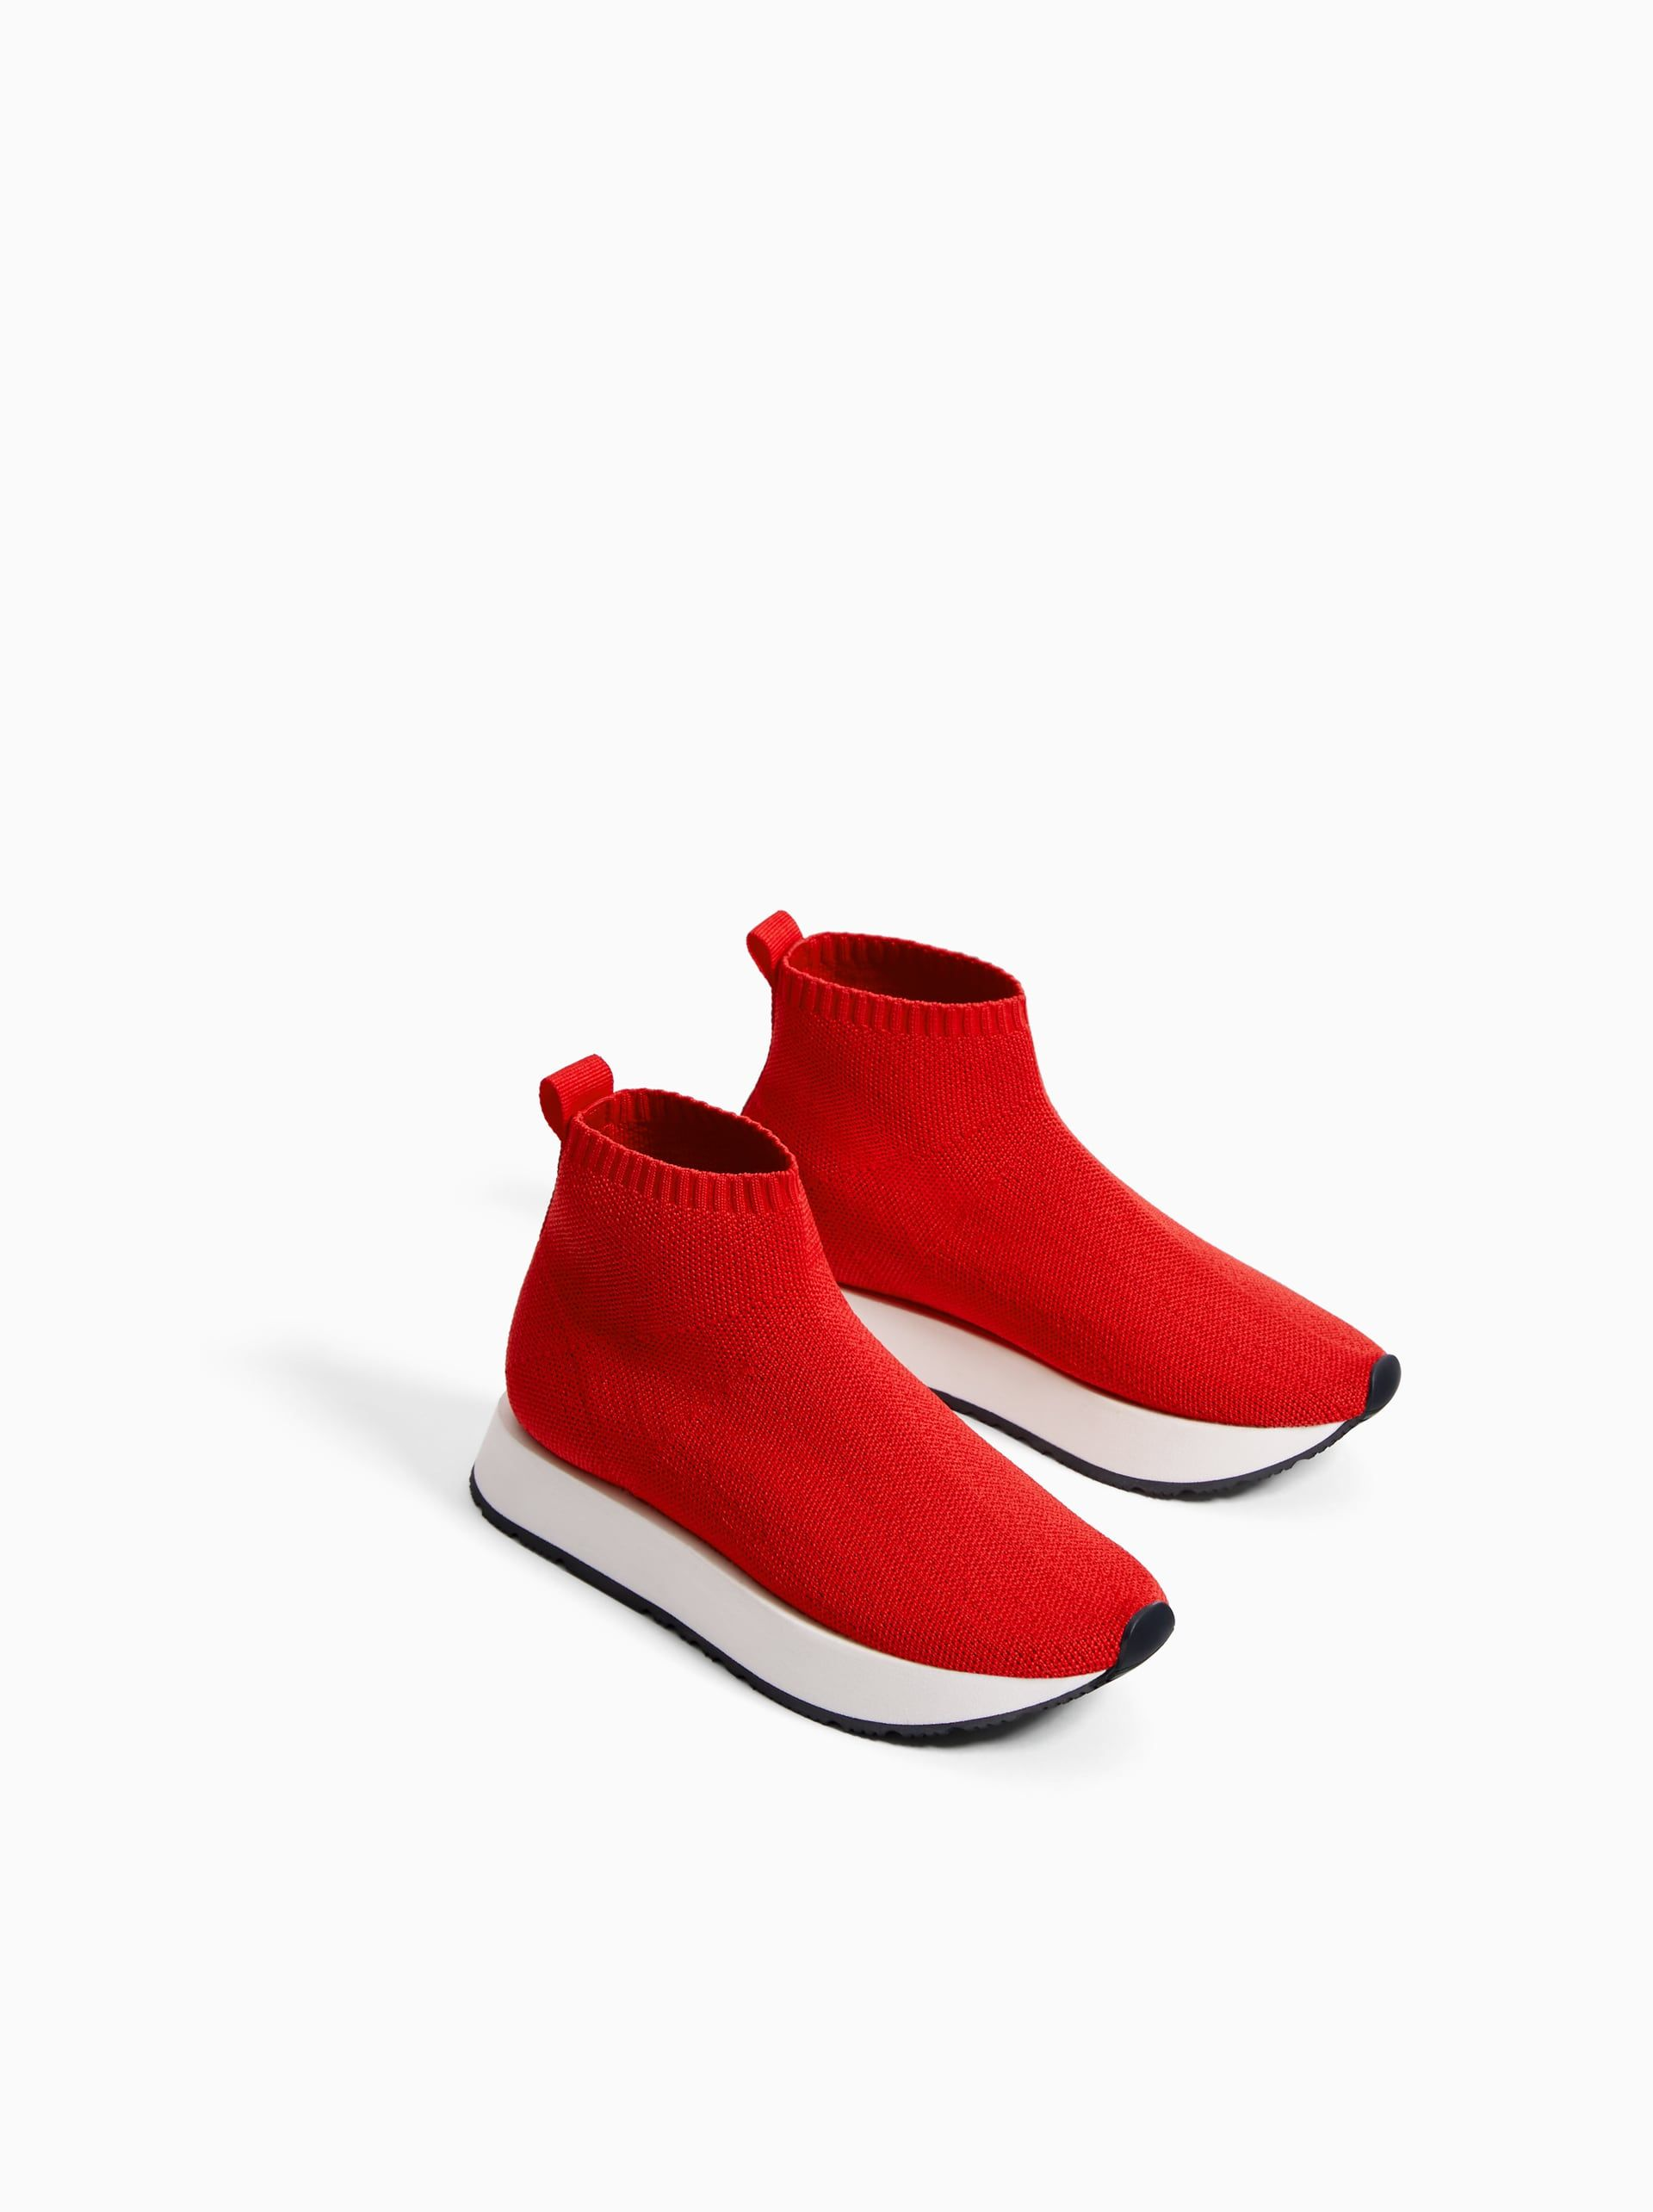 5a76ed295c2 Afbeelding 2 van HIGH-TOP SNEAKERS MET SOK van Zara   Shoes in 2019 ...